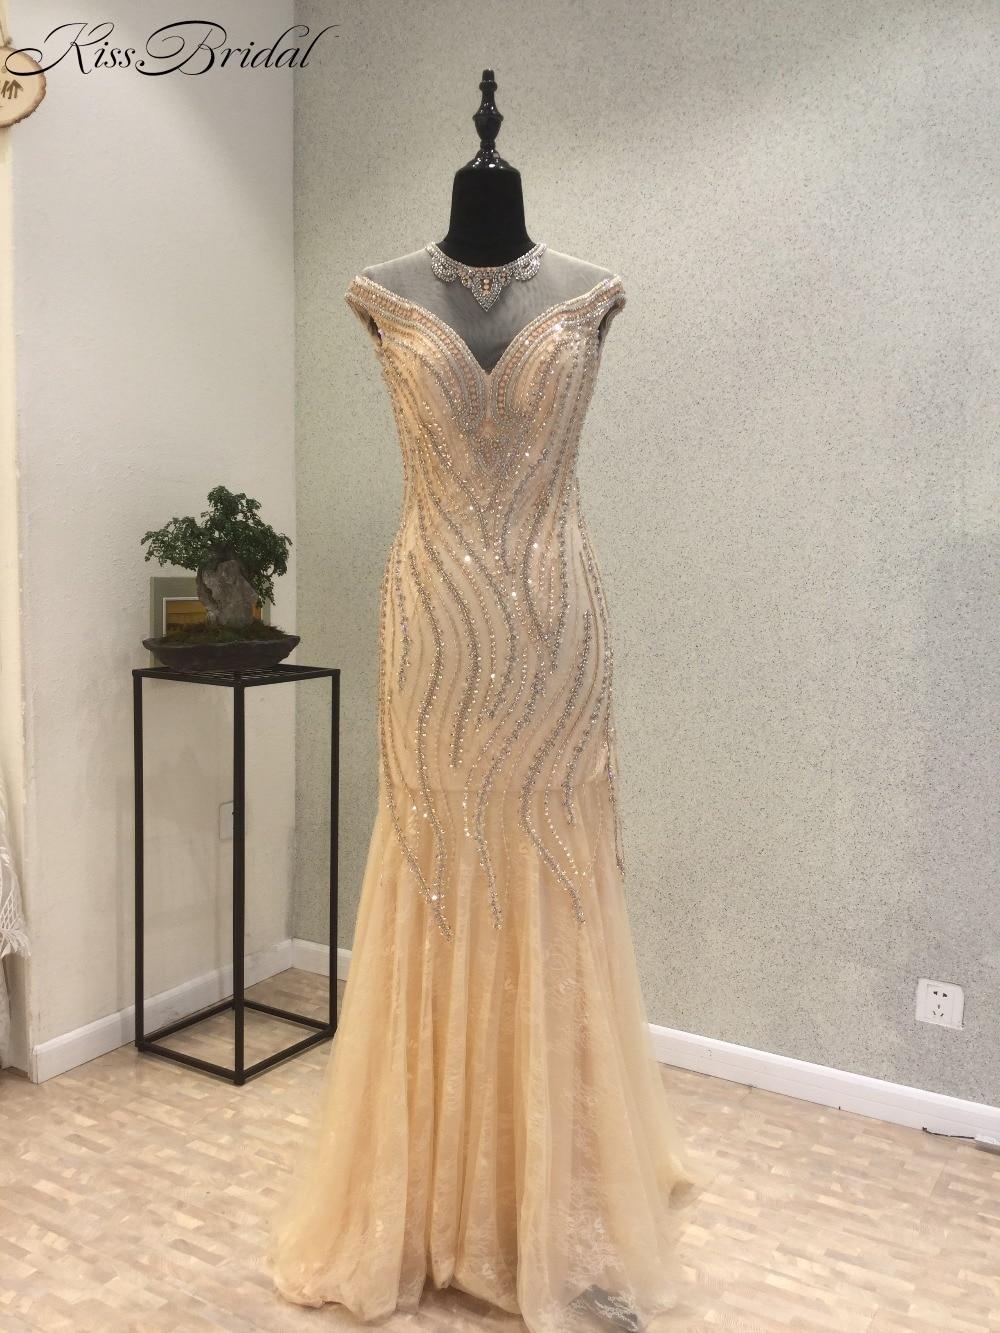 Fashionable Mermaid   Evening     Dress   Zipper Back Beading Tulle Champagne Prom Party   Dresses   Sleeveless